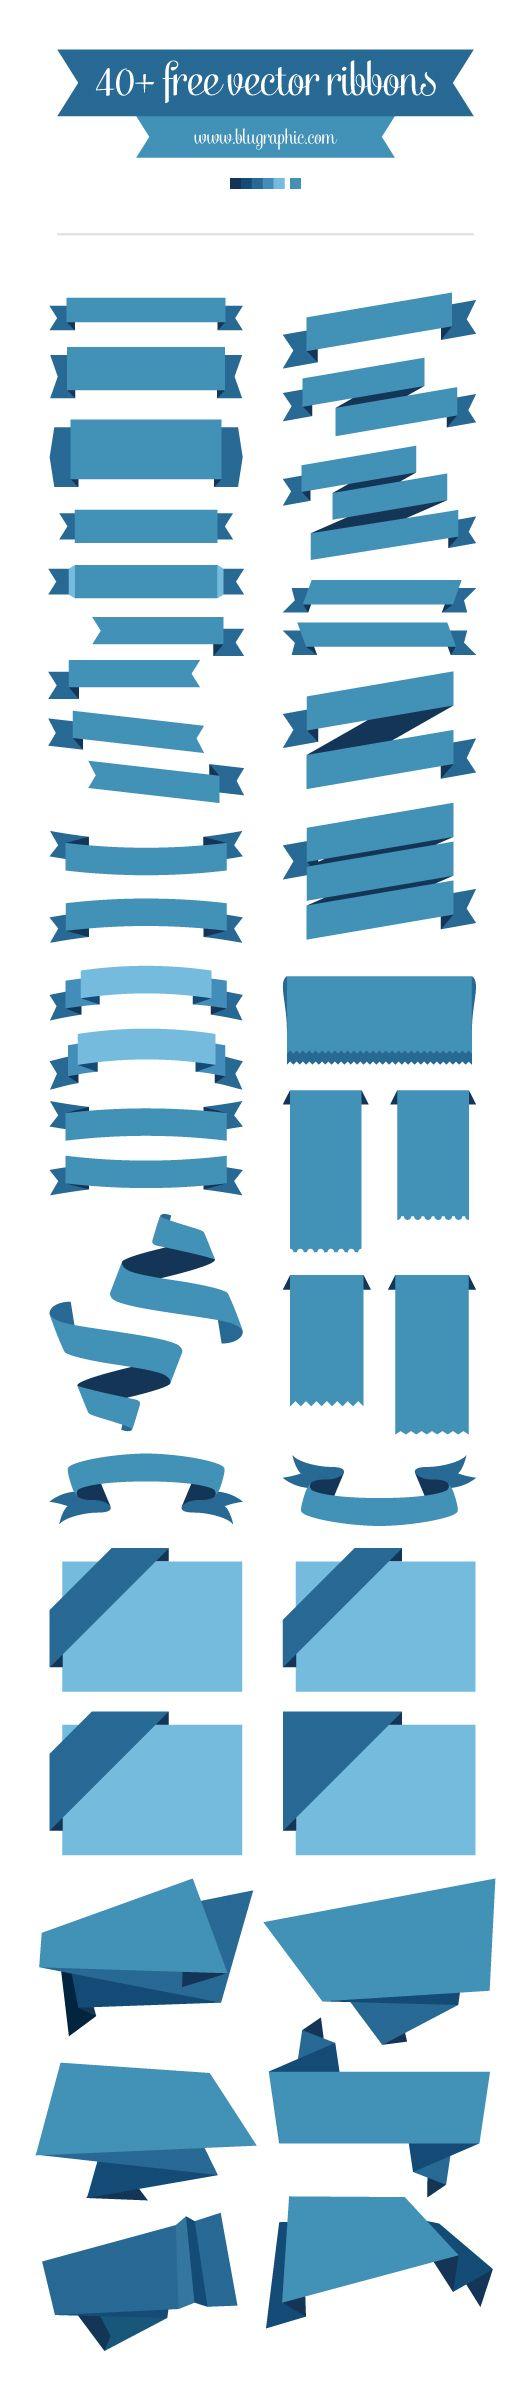 40+ Free Vector Ribbons   Web Design Inspiration   Pinterest ...